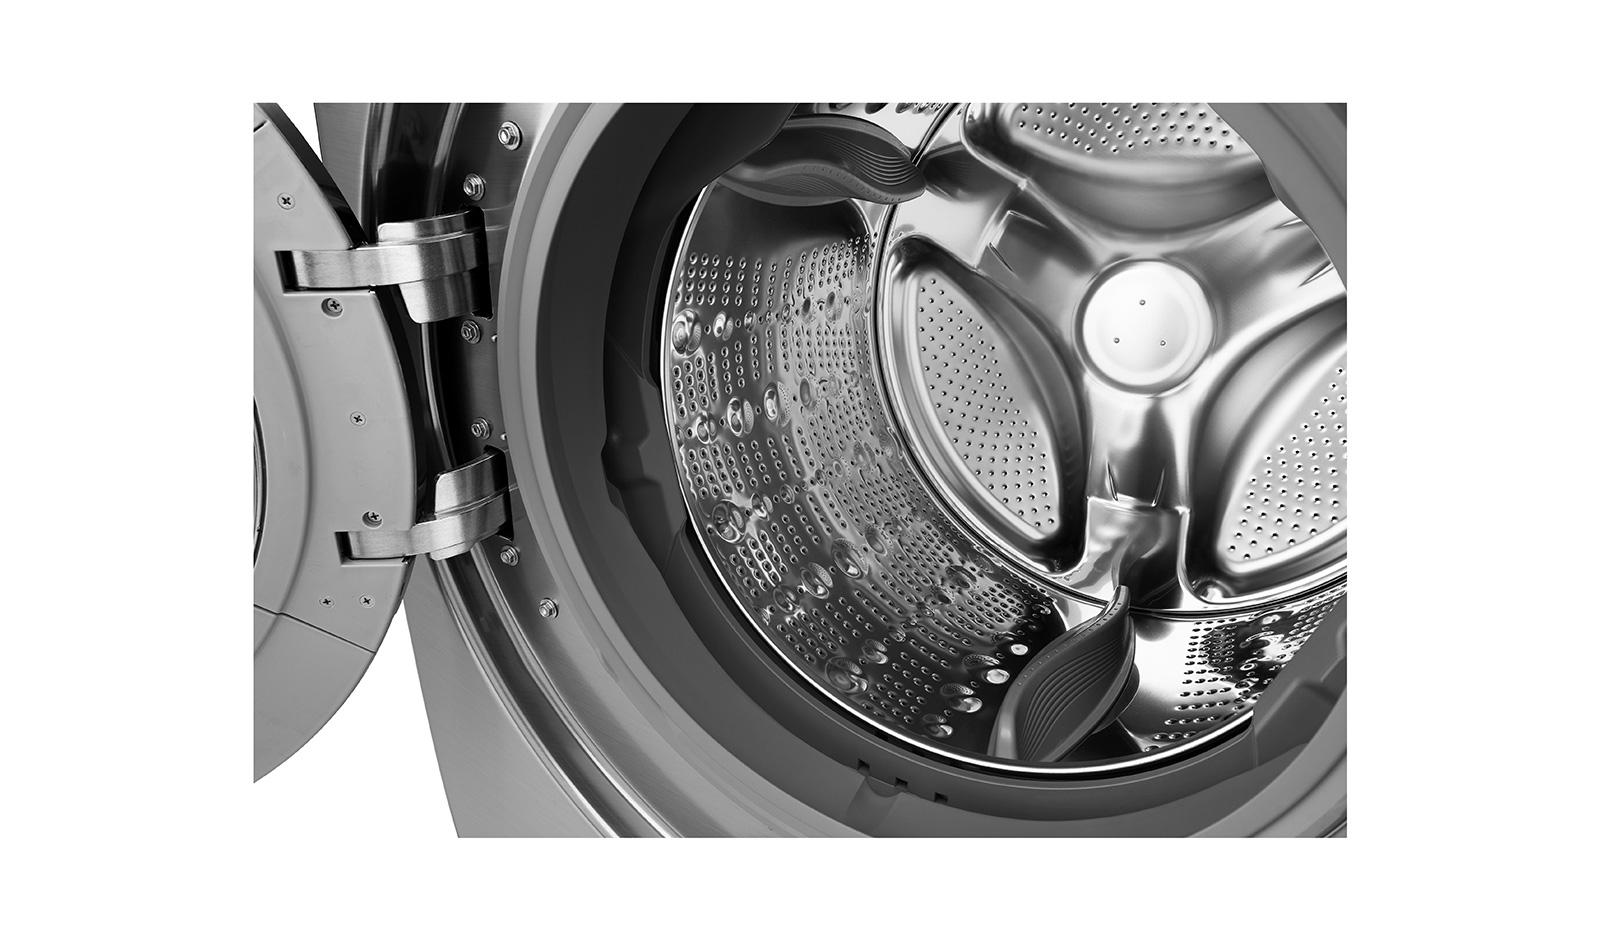 mesin cuci LG frontloading 20kg